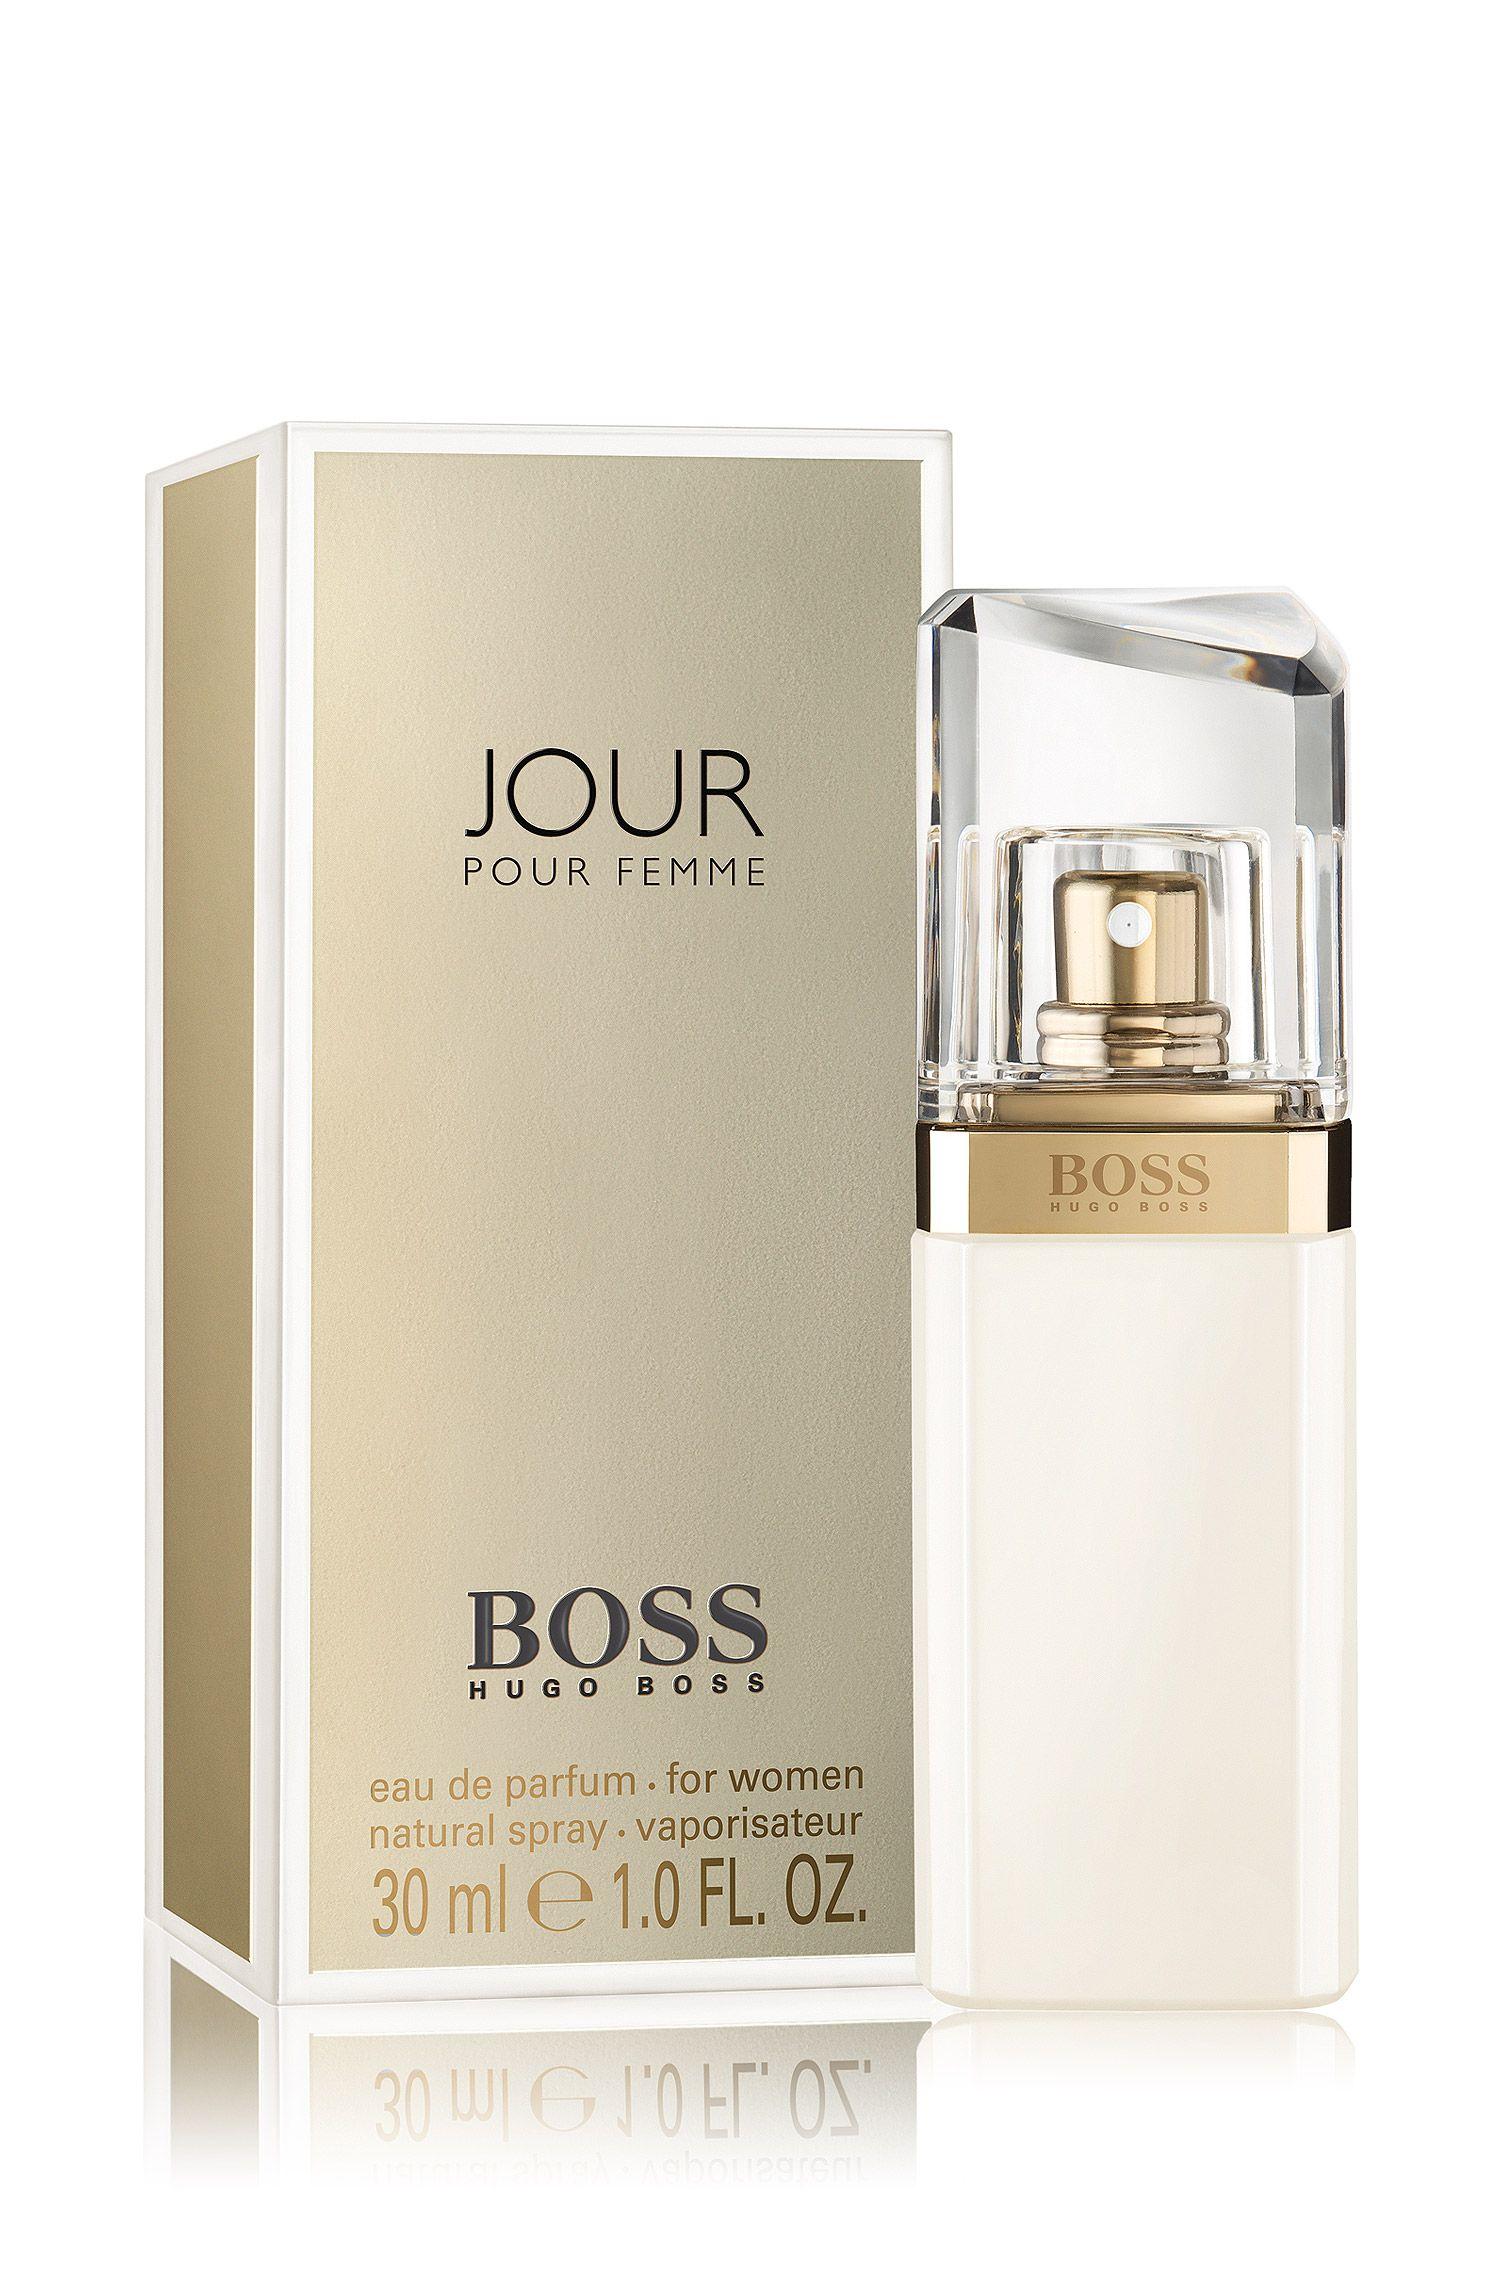 Eau de parfum BOSS Jour 30ml